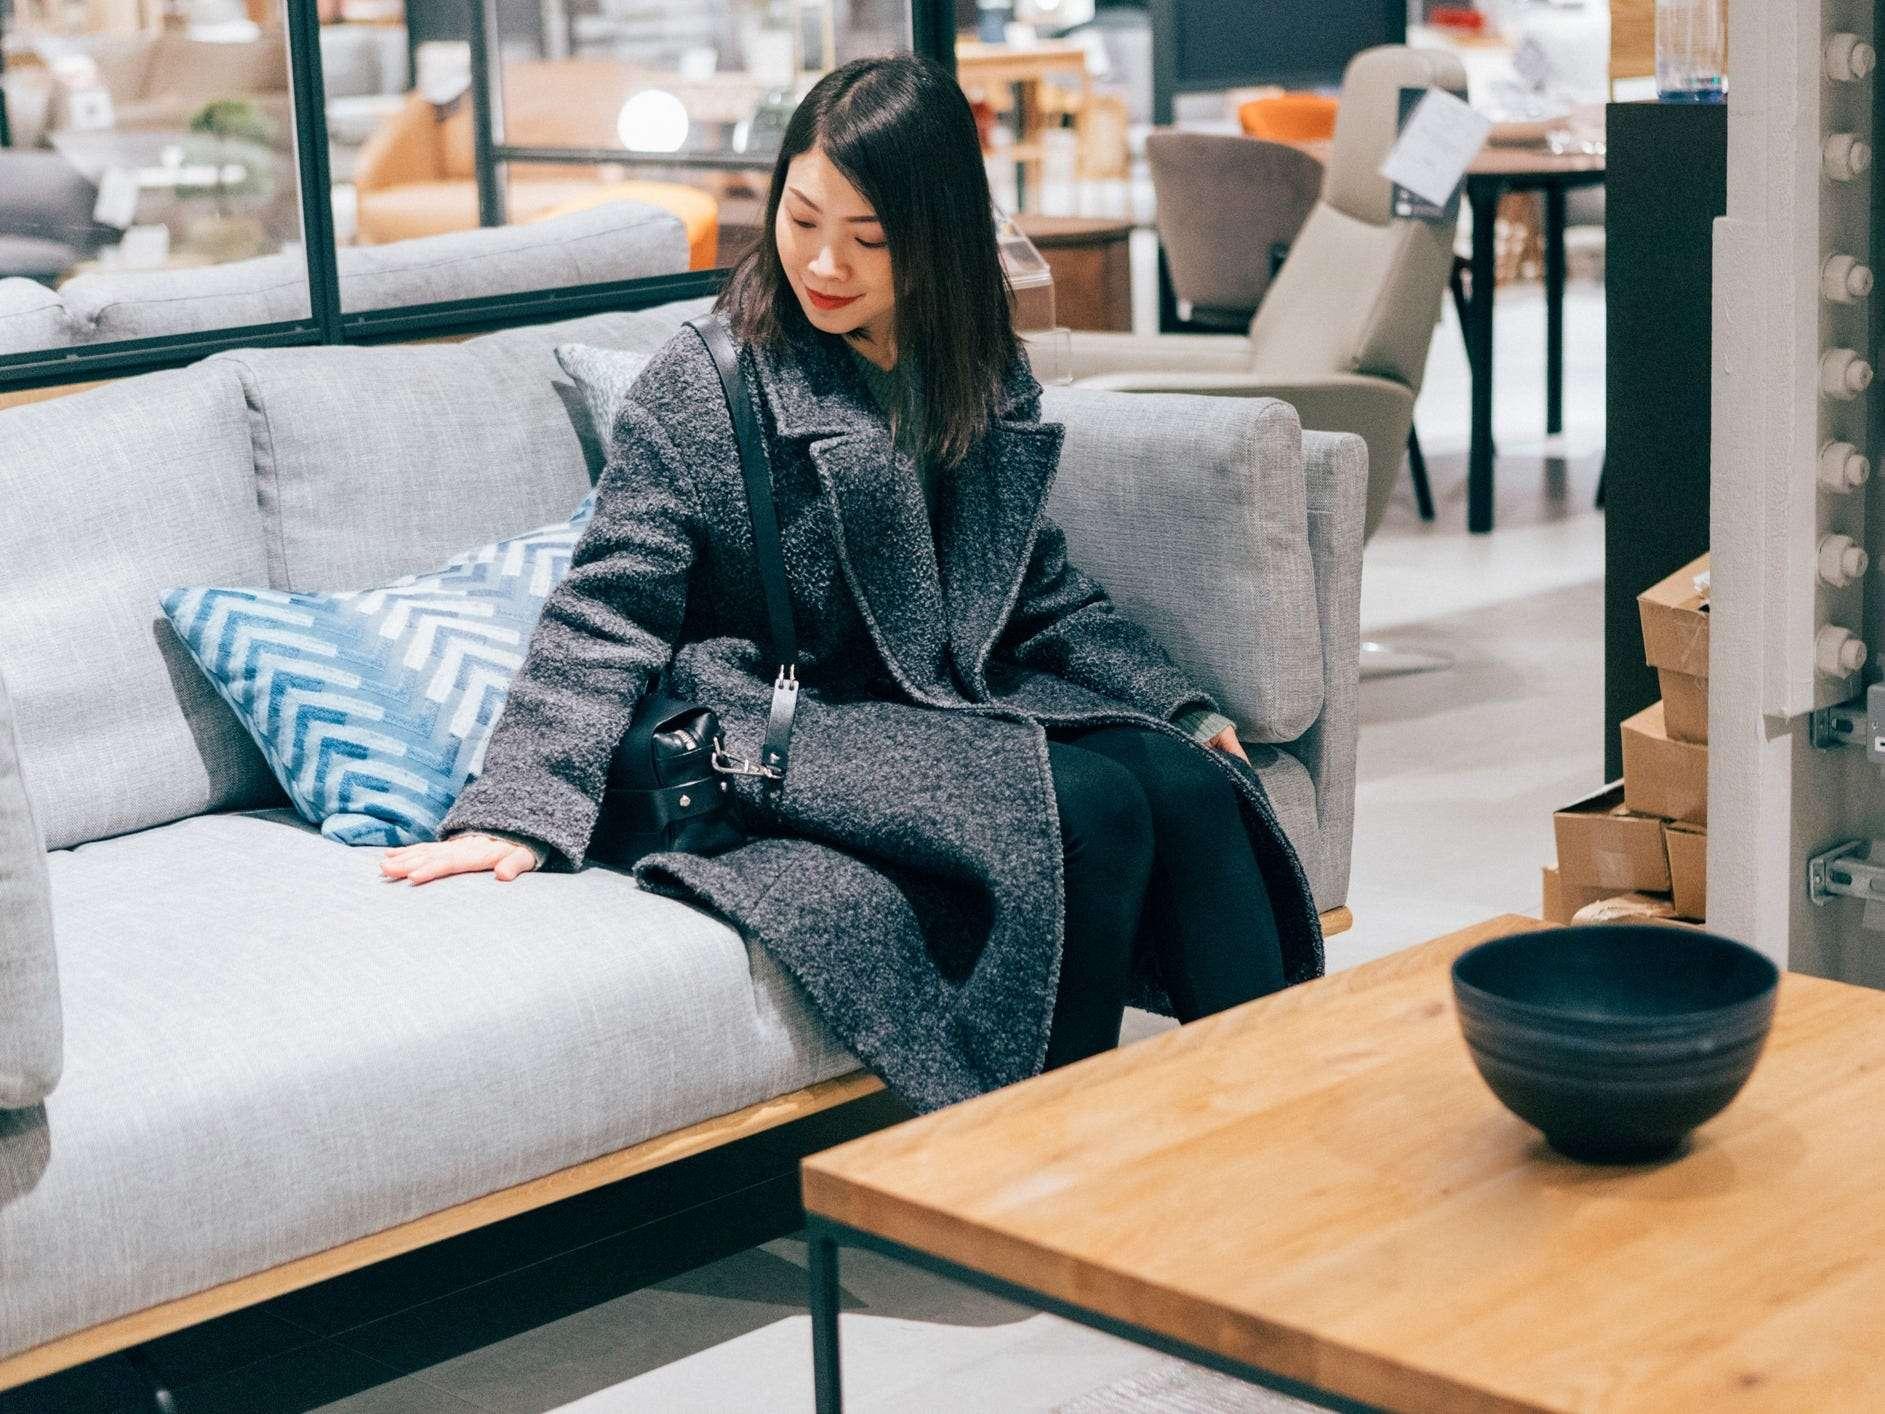 Interior Designers Reveal The Biggest Design Mistakes People Make Insider